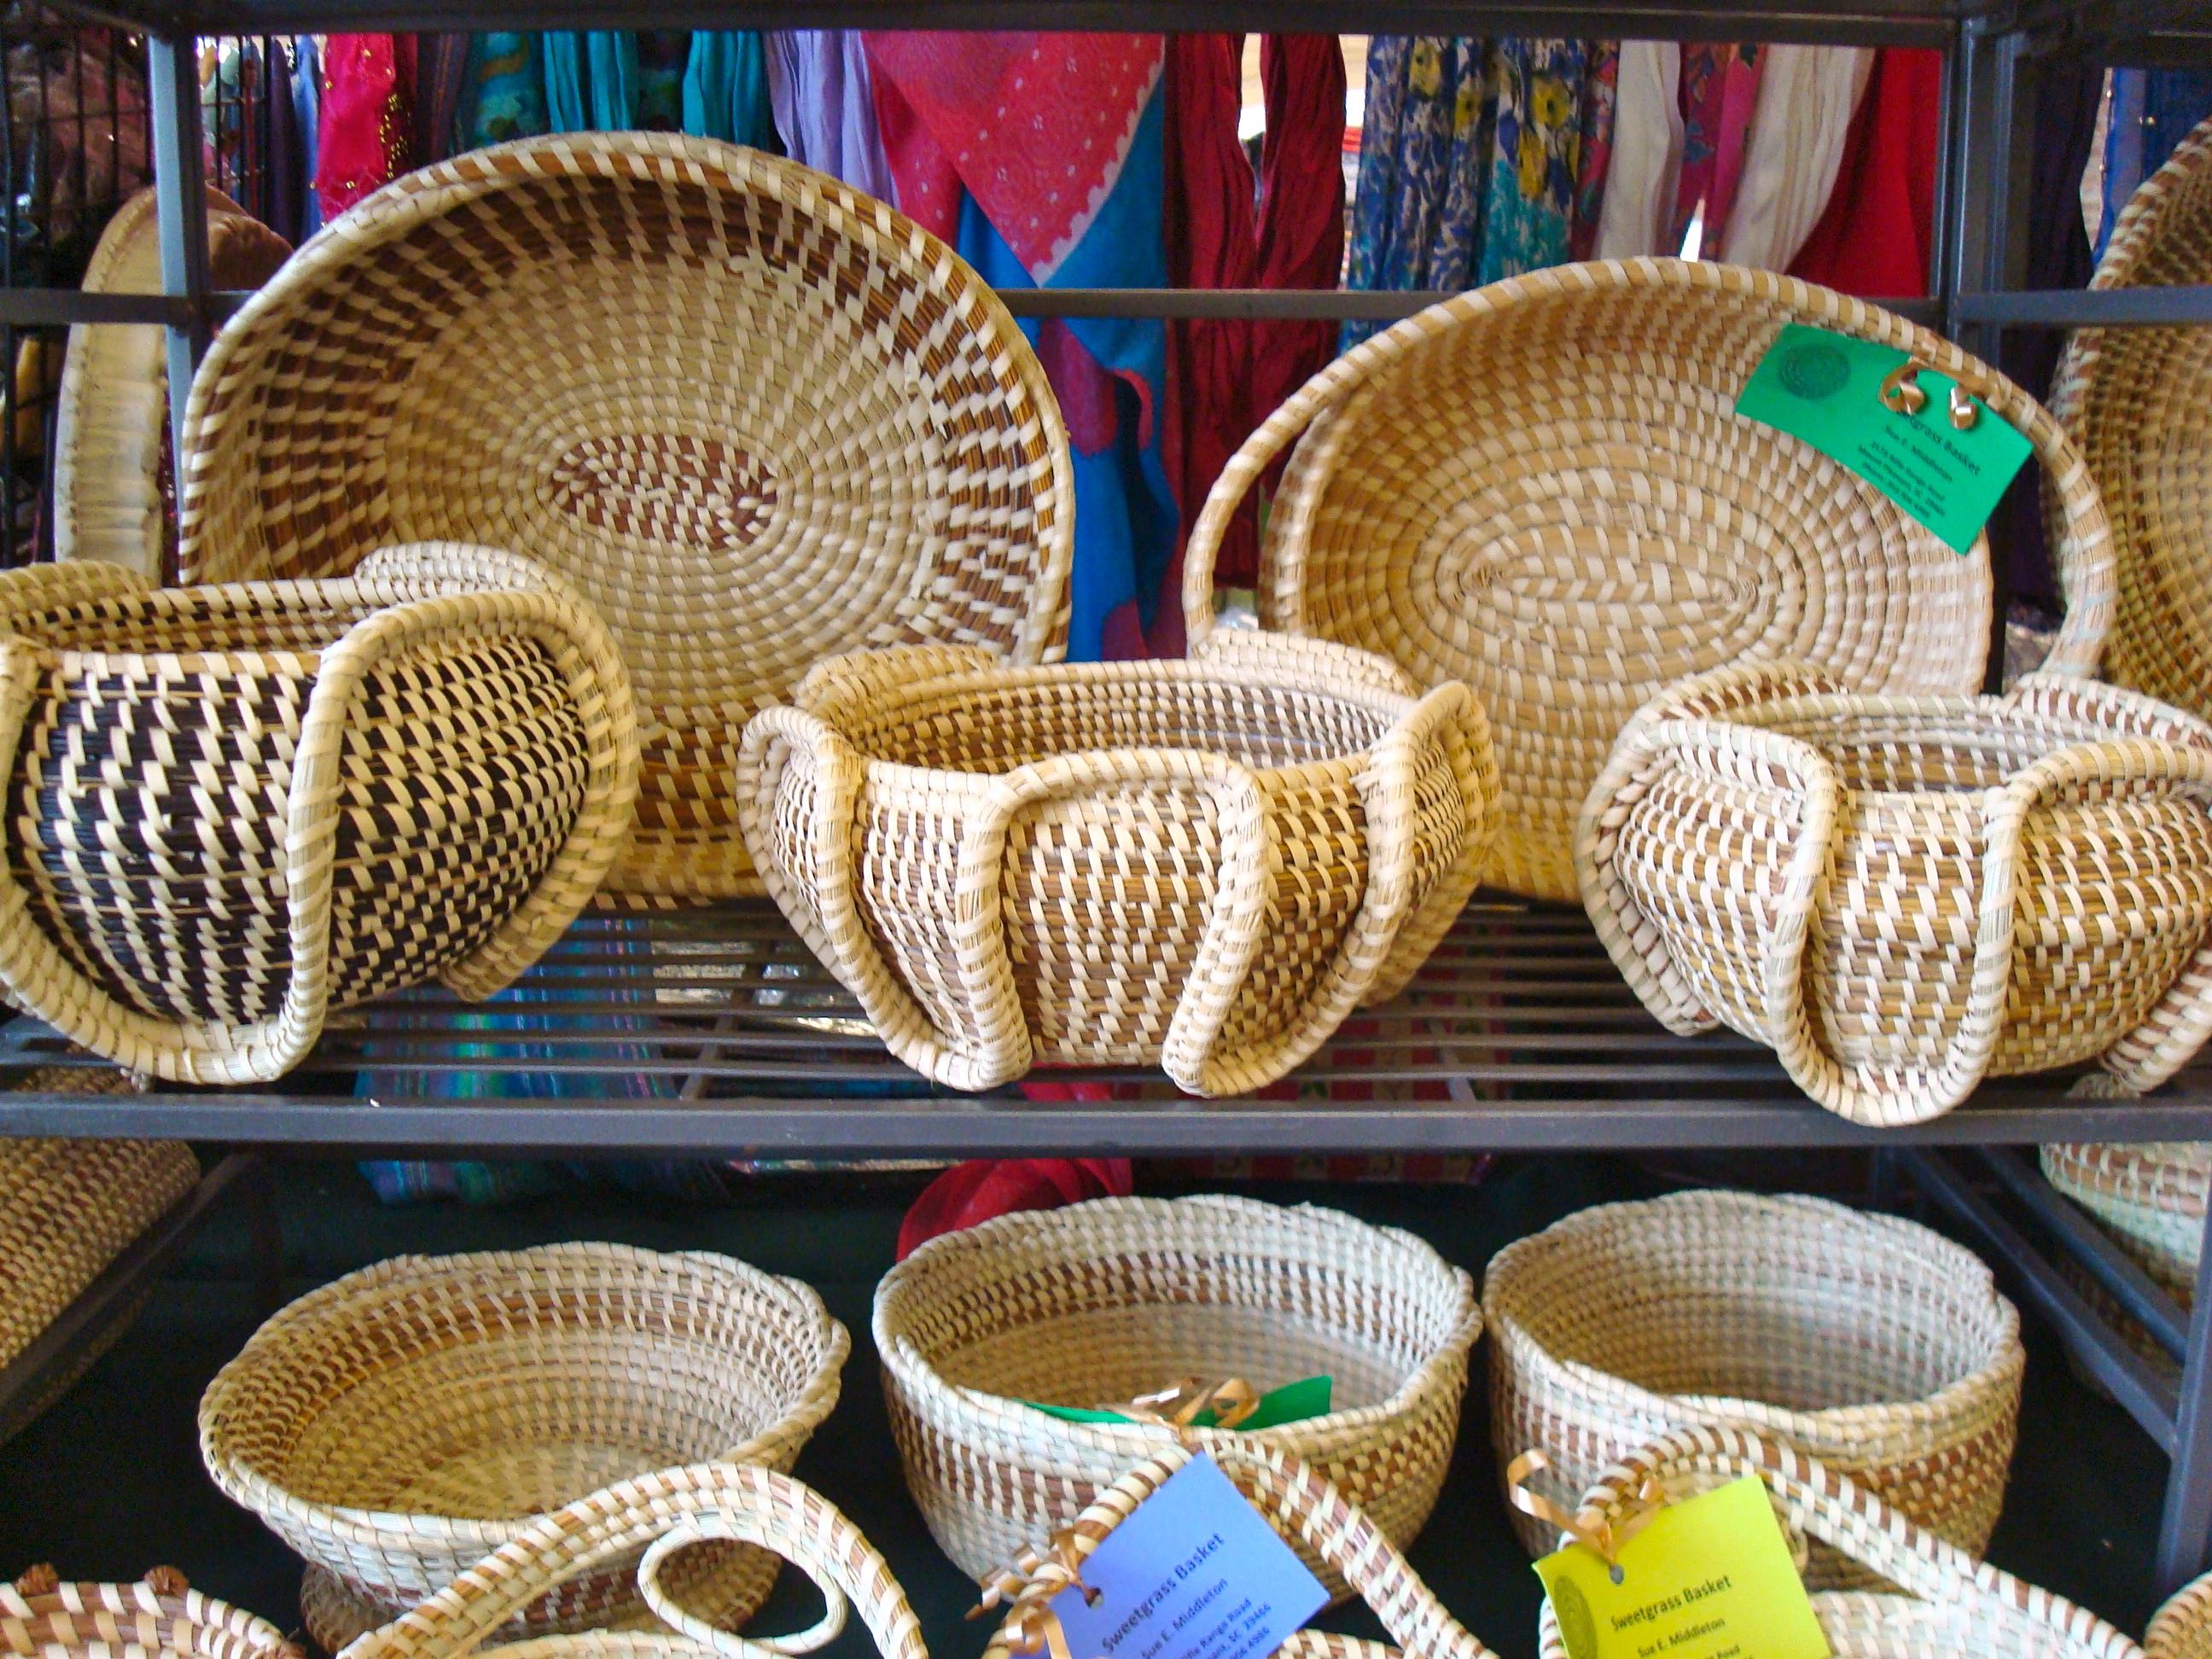 Handmade Baskets In Charleston : Historic charleston revisited back road journal